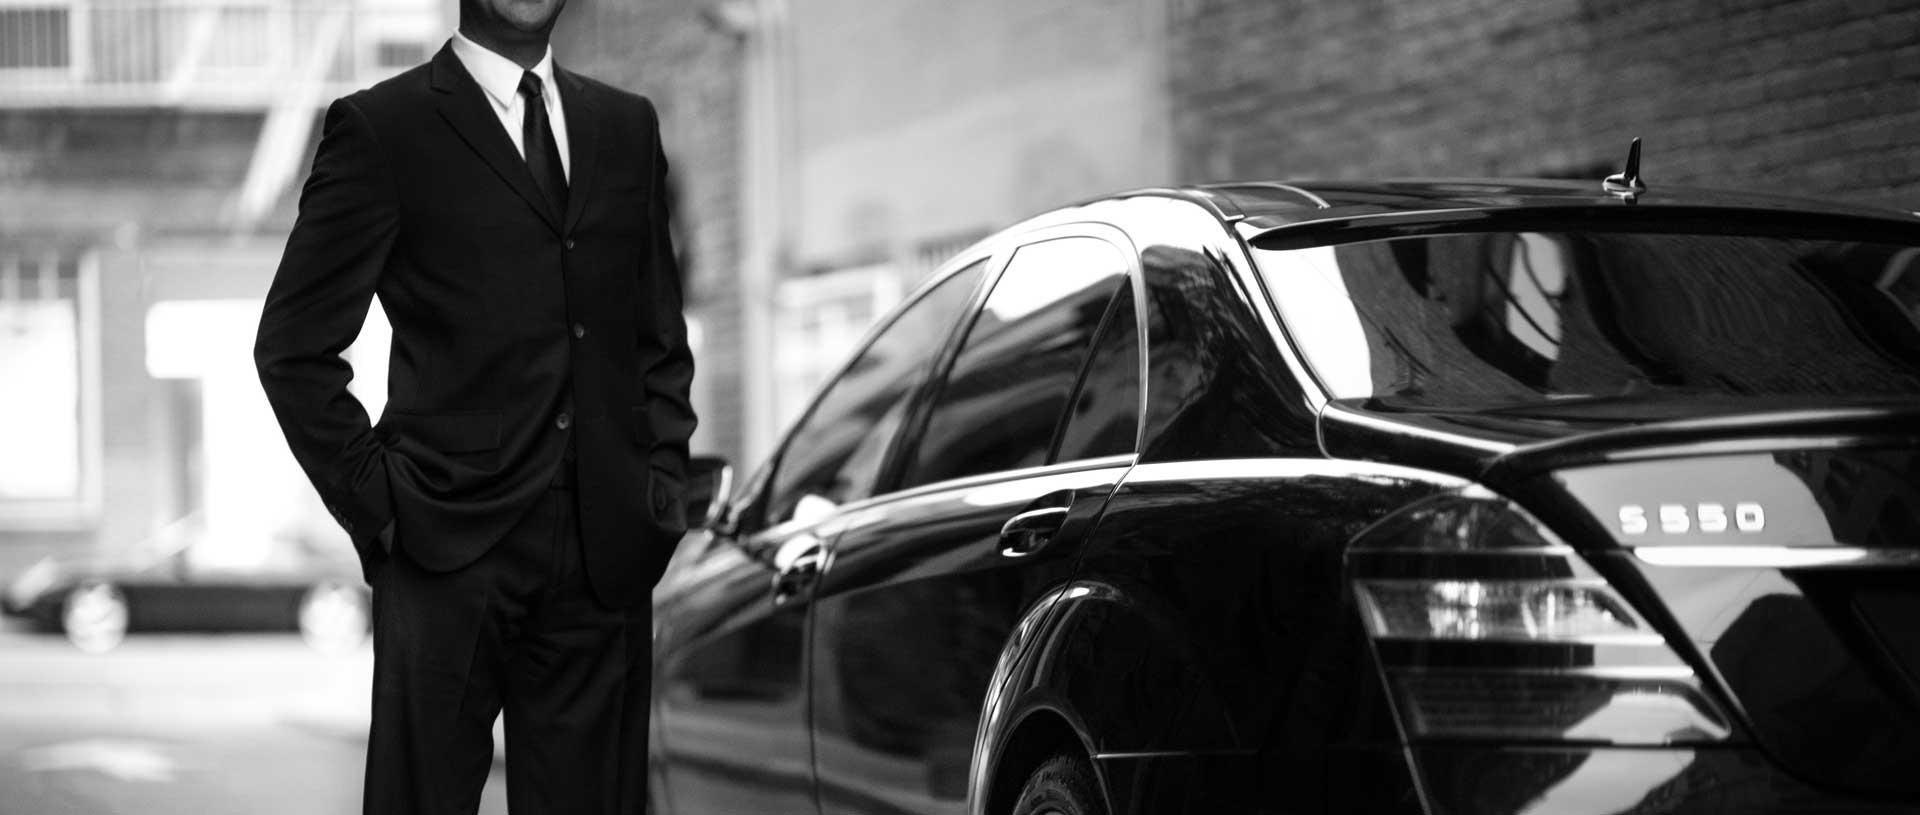 book aa chauffeur services london